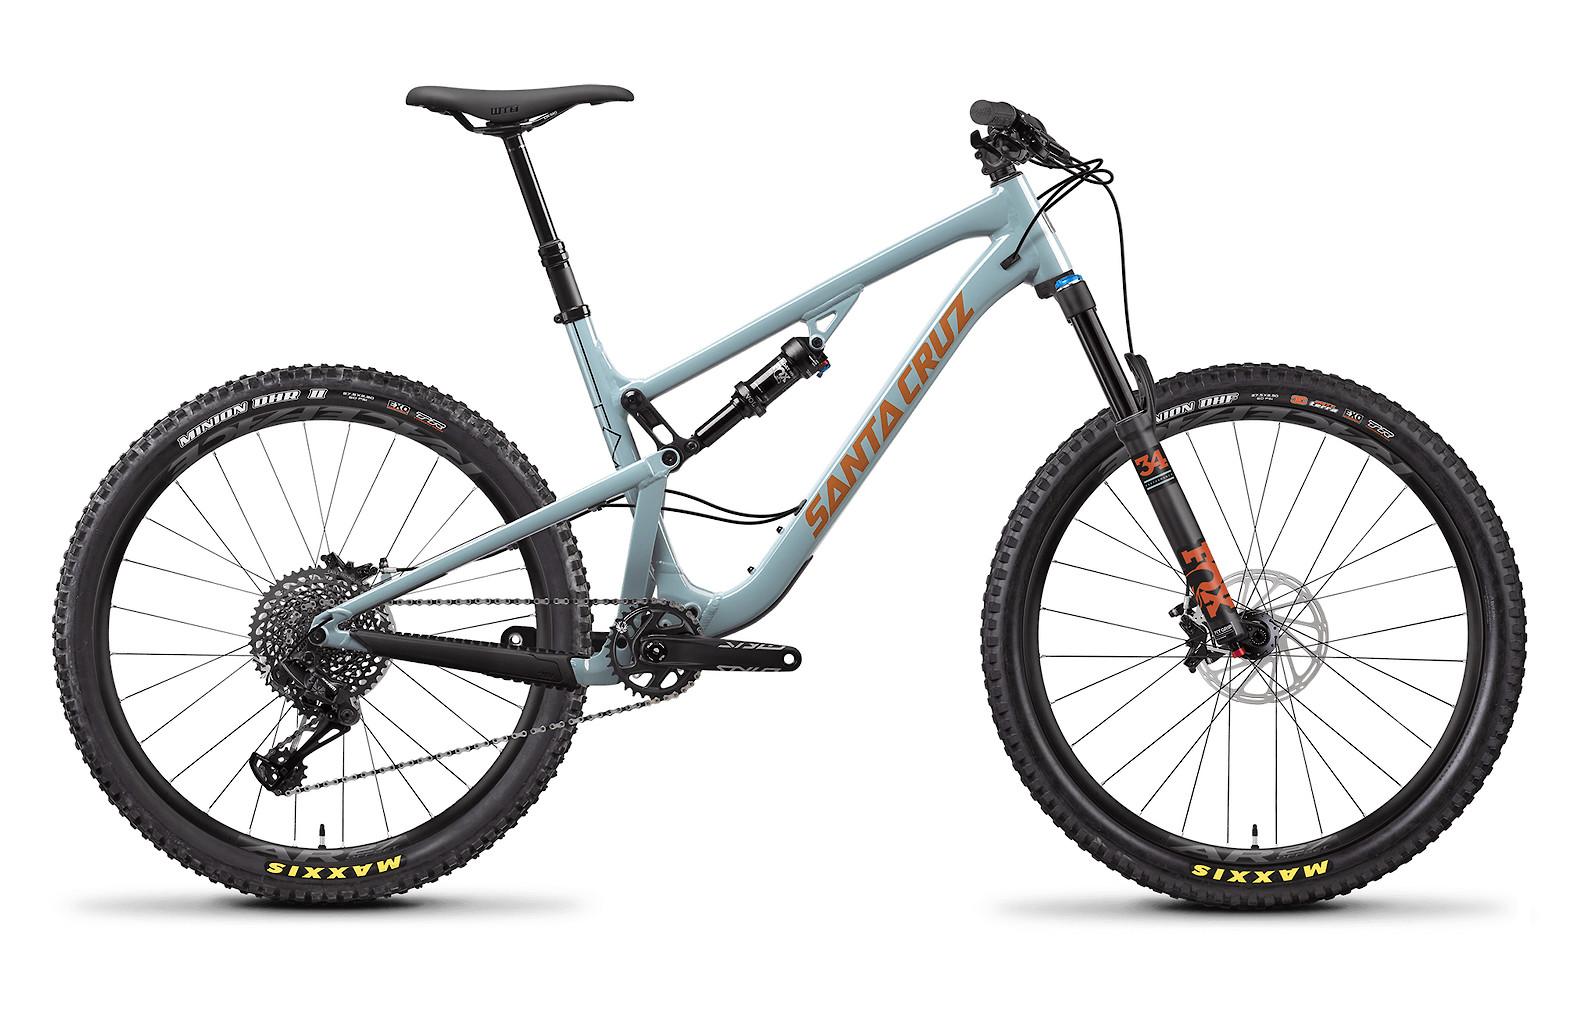 2020 Santa Cruz 5010 Aluminum S (Regular Build, Robins Egg and Orange)